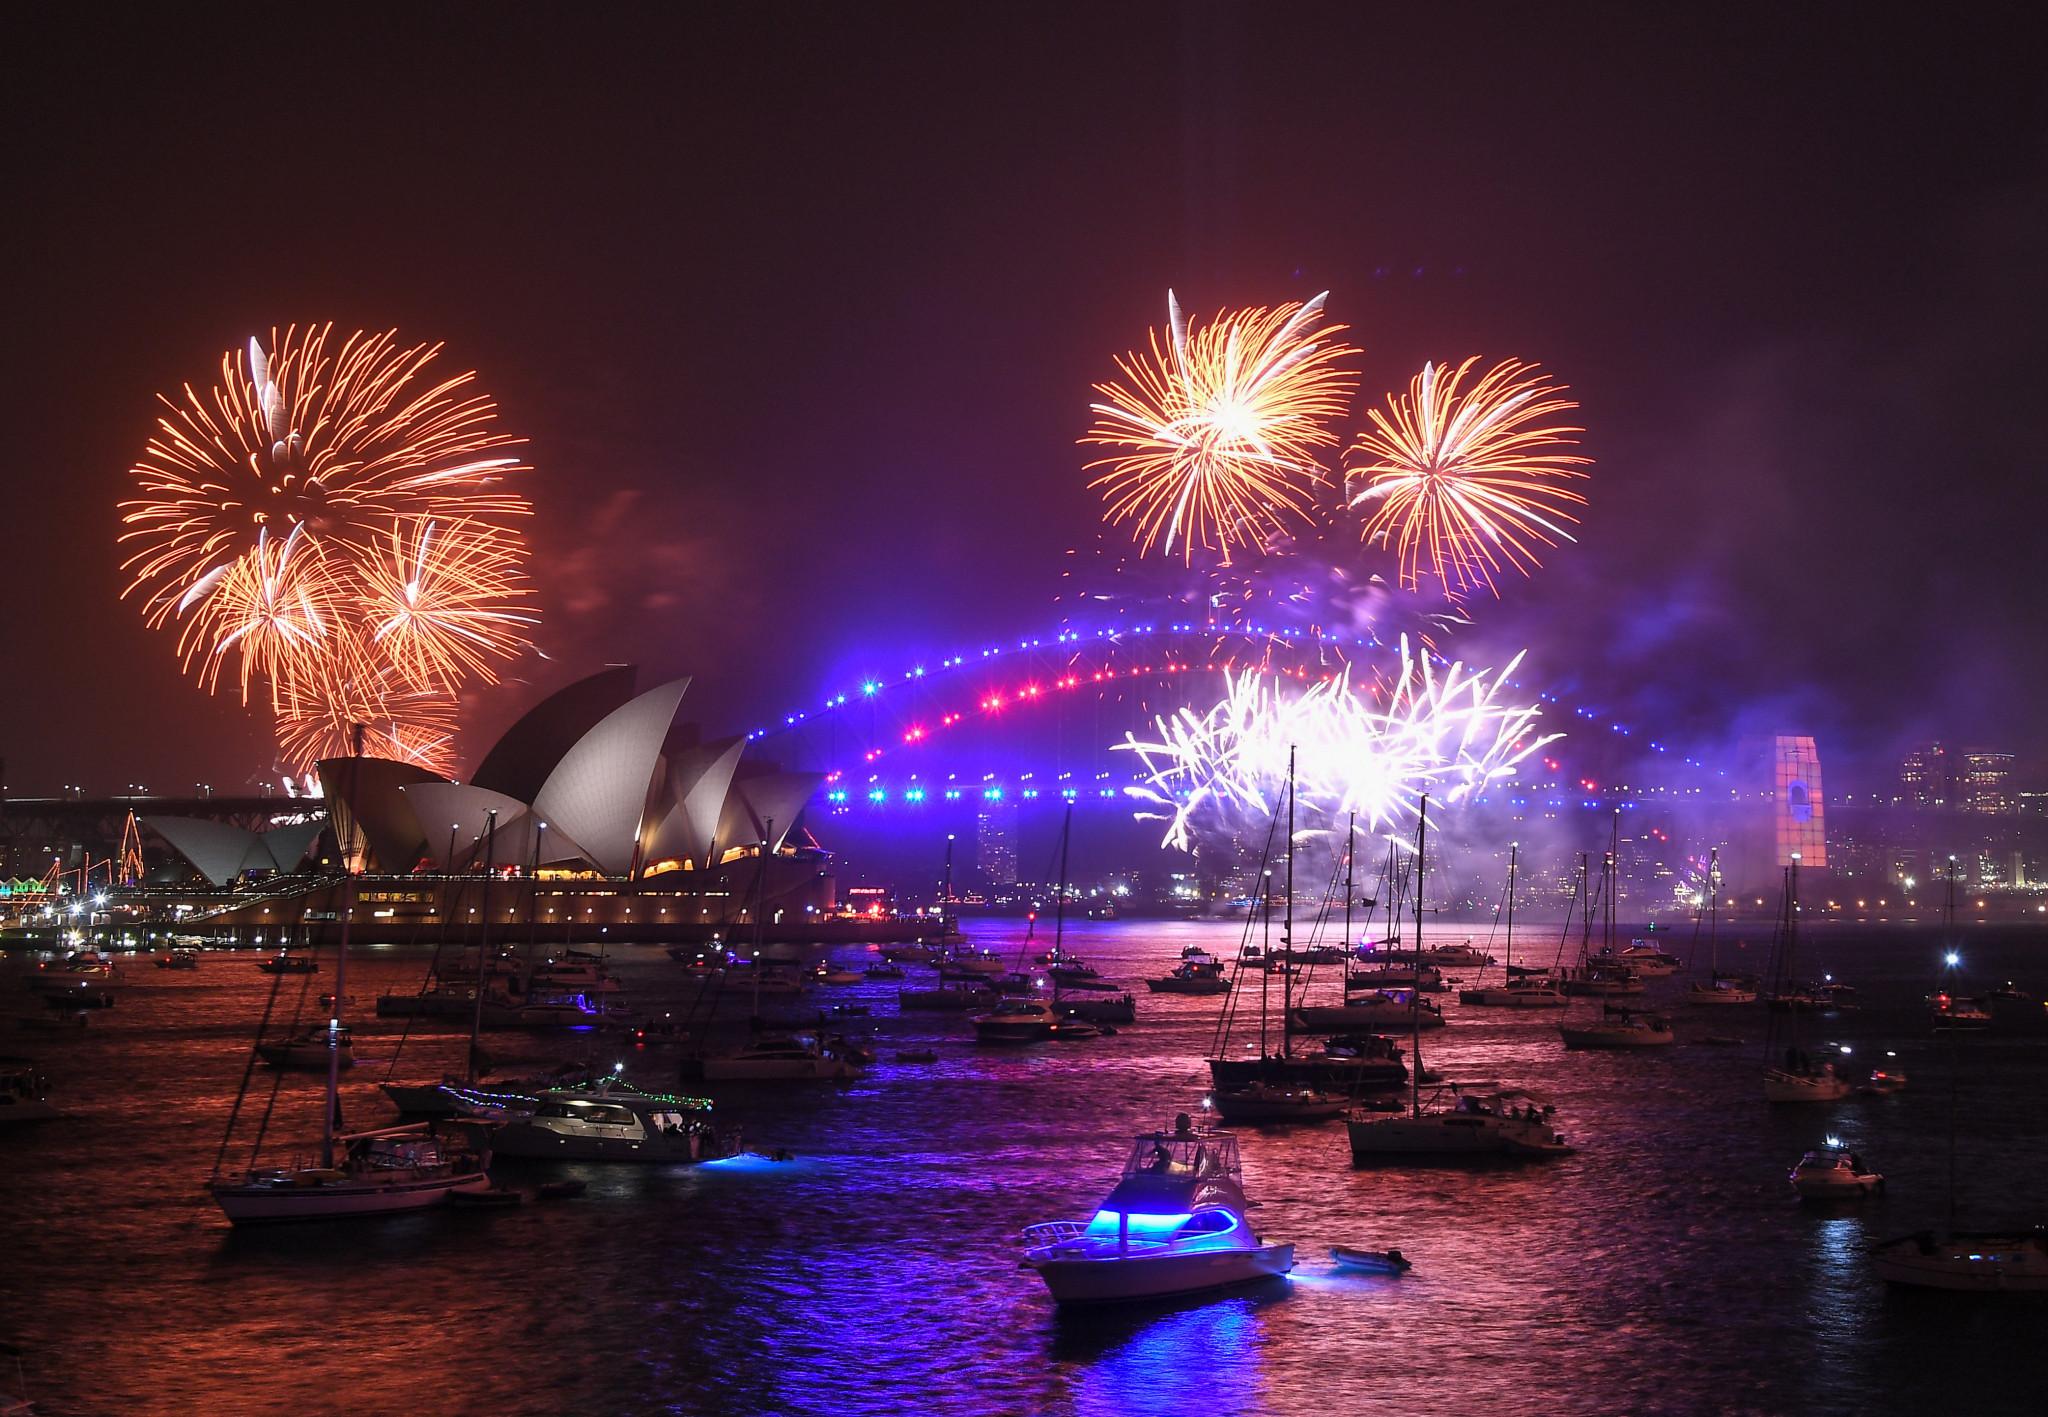 Sydney to host 2027 Netball World Cup during Netball Australia's centenary